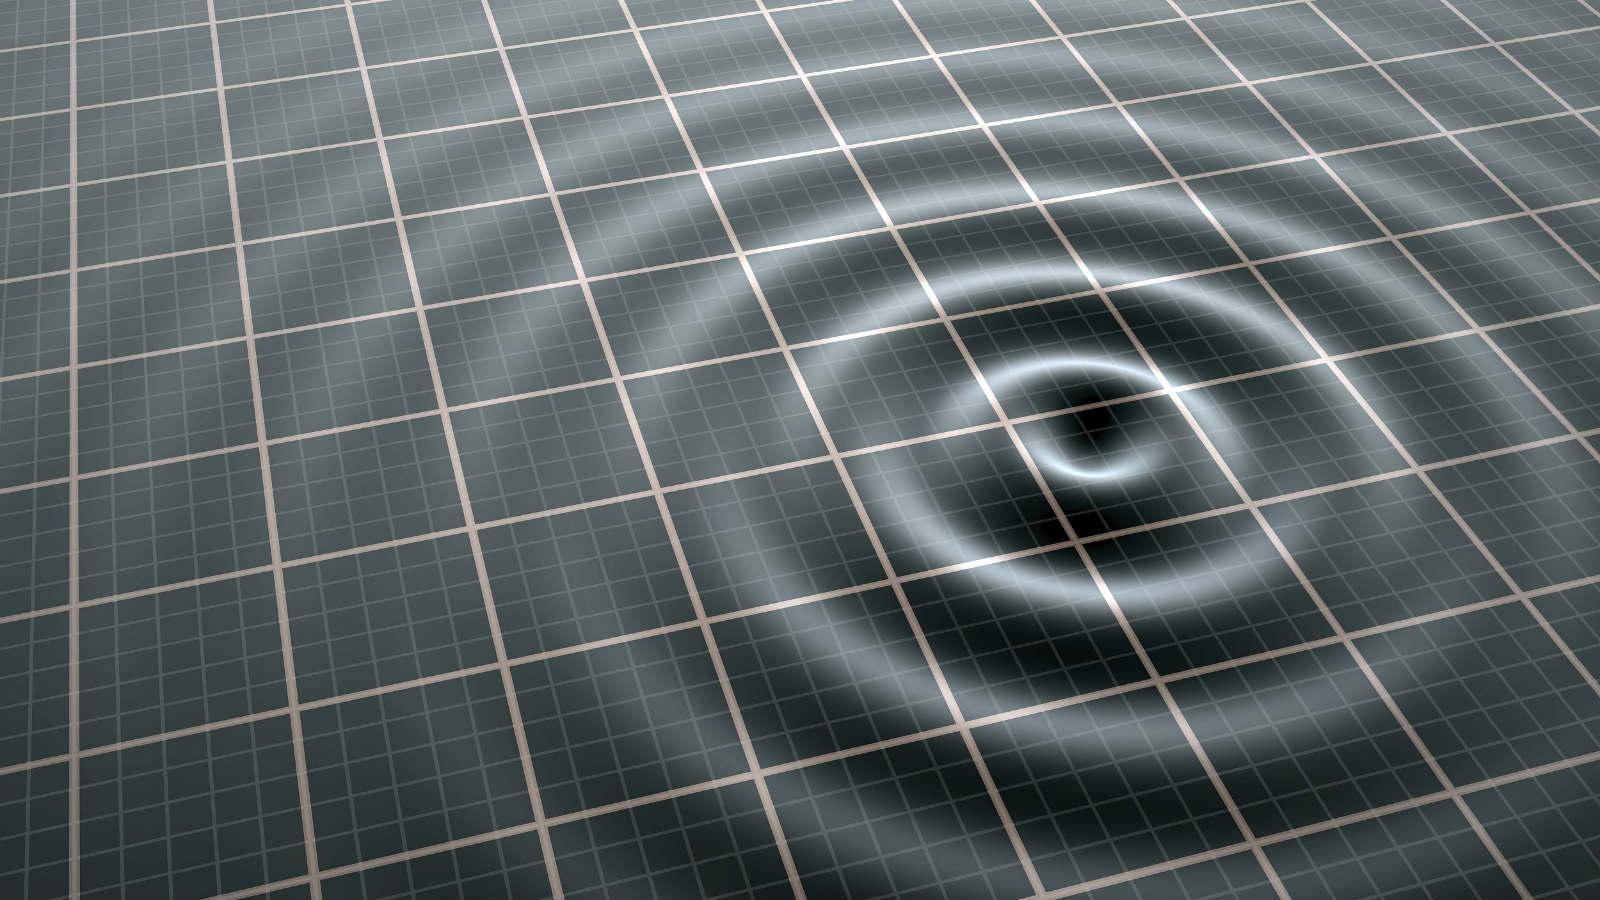 5.6-magnitude quake hits off Hachinohe, Japan